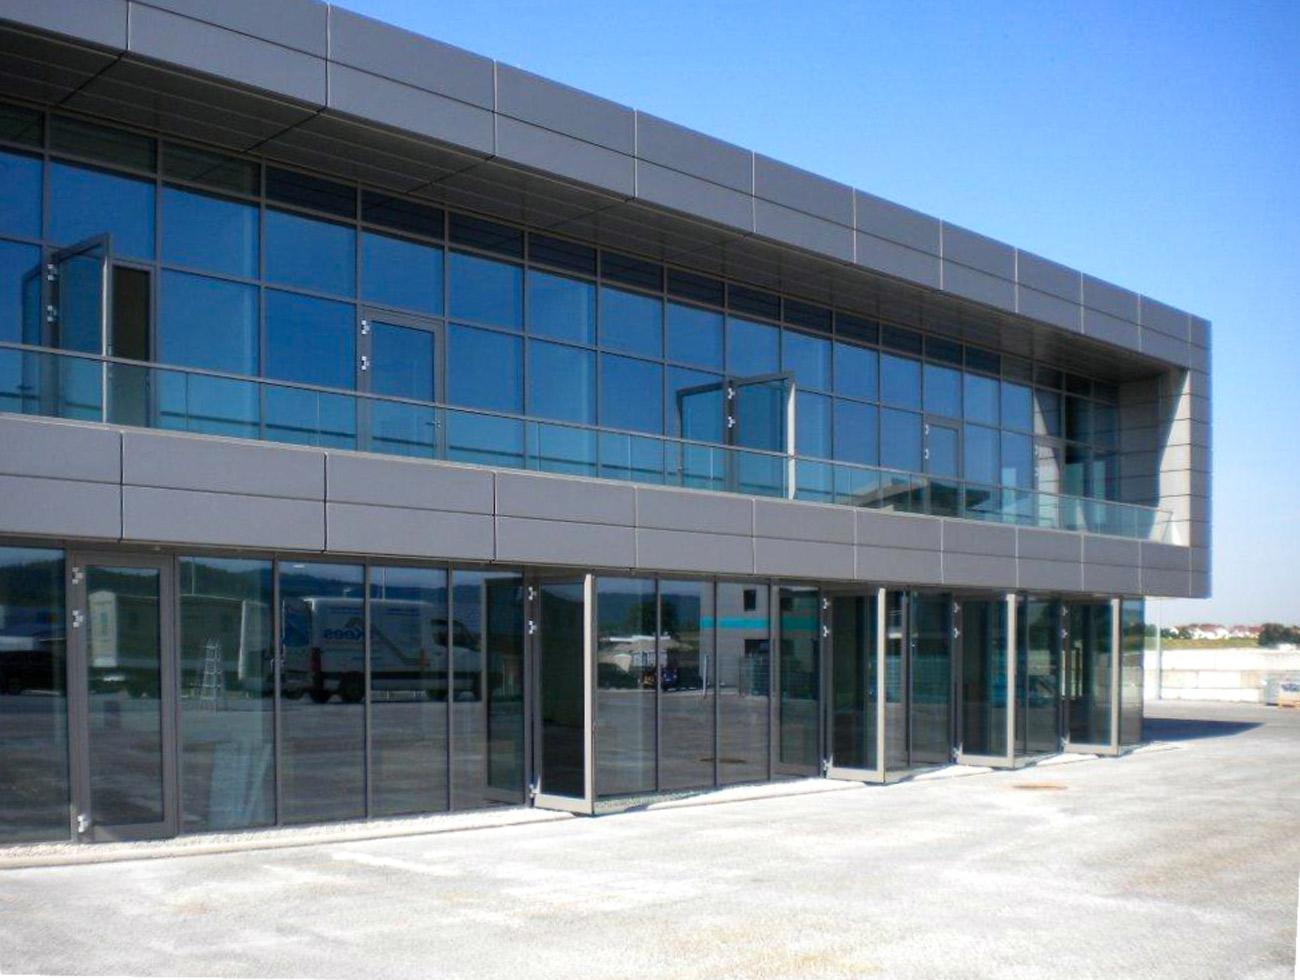 Fensterfront Verwaltungsgebäude, Backnang Neubau